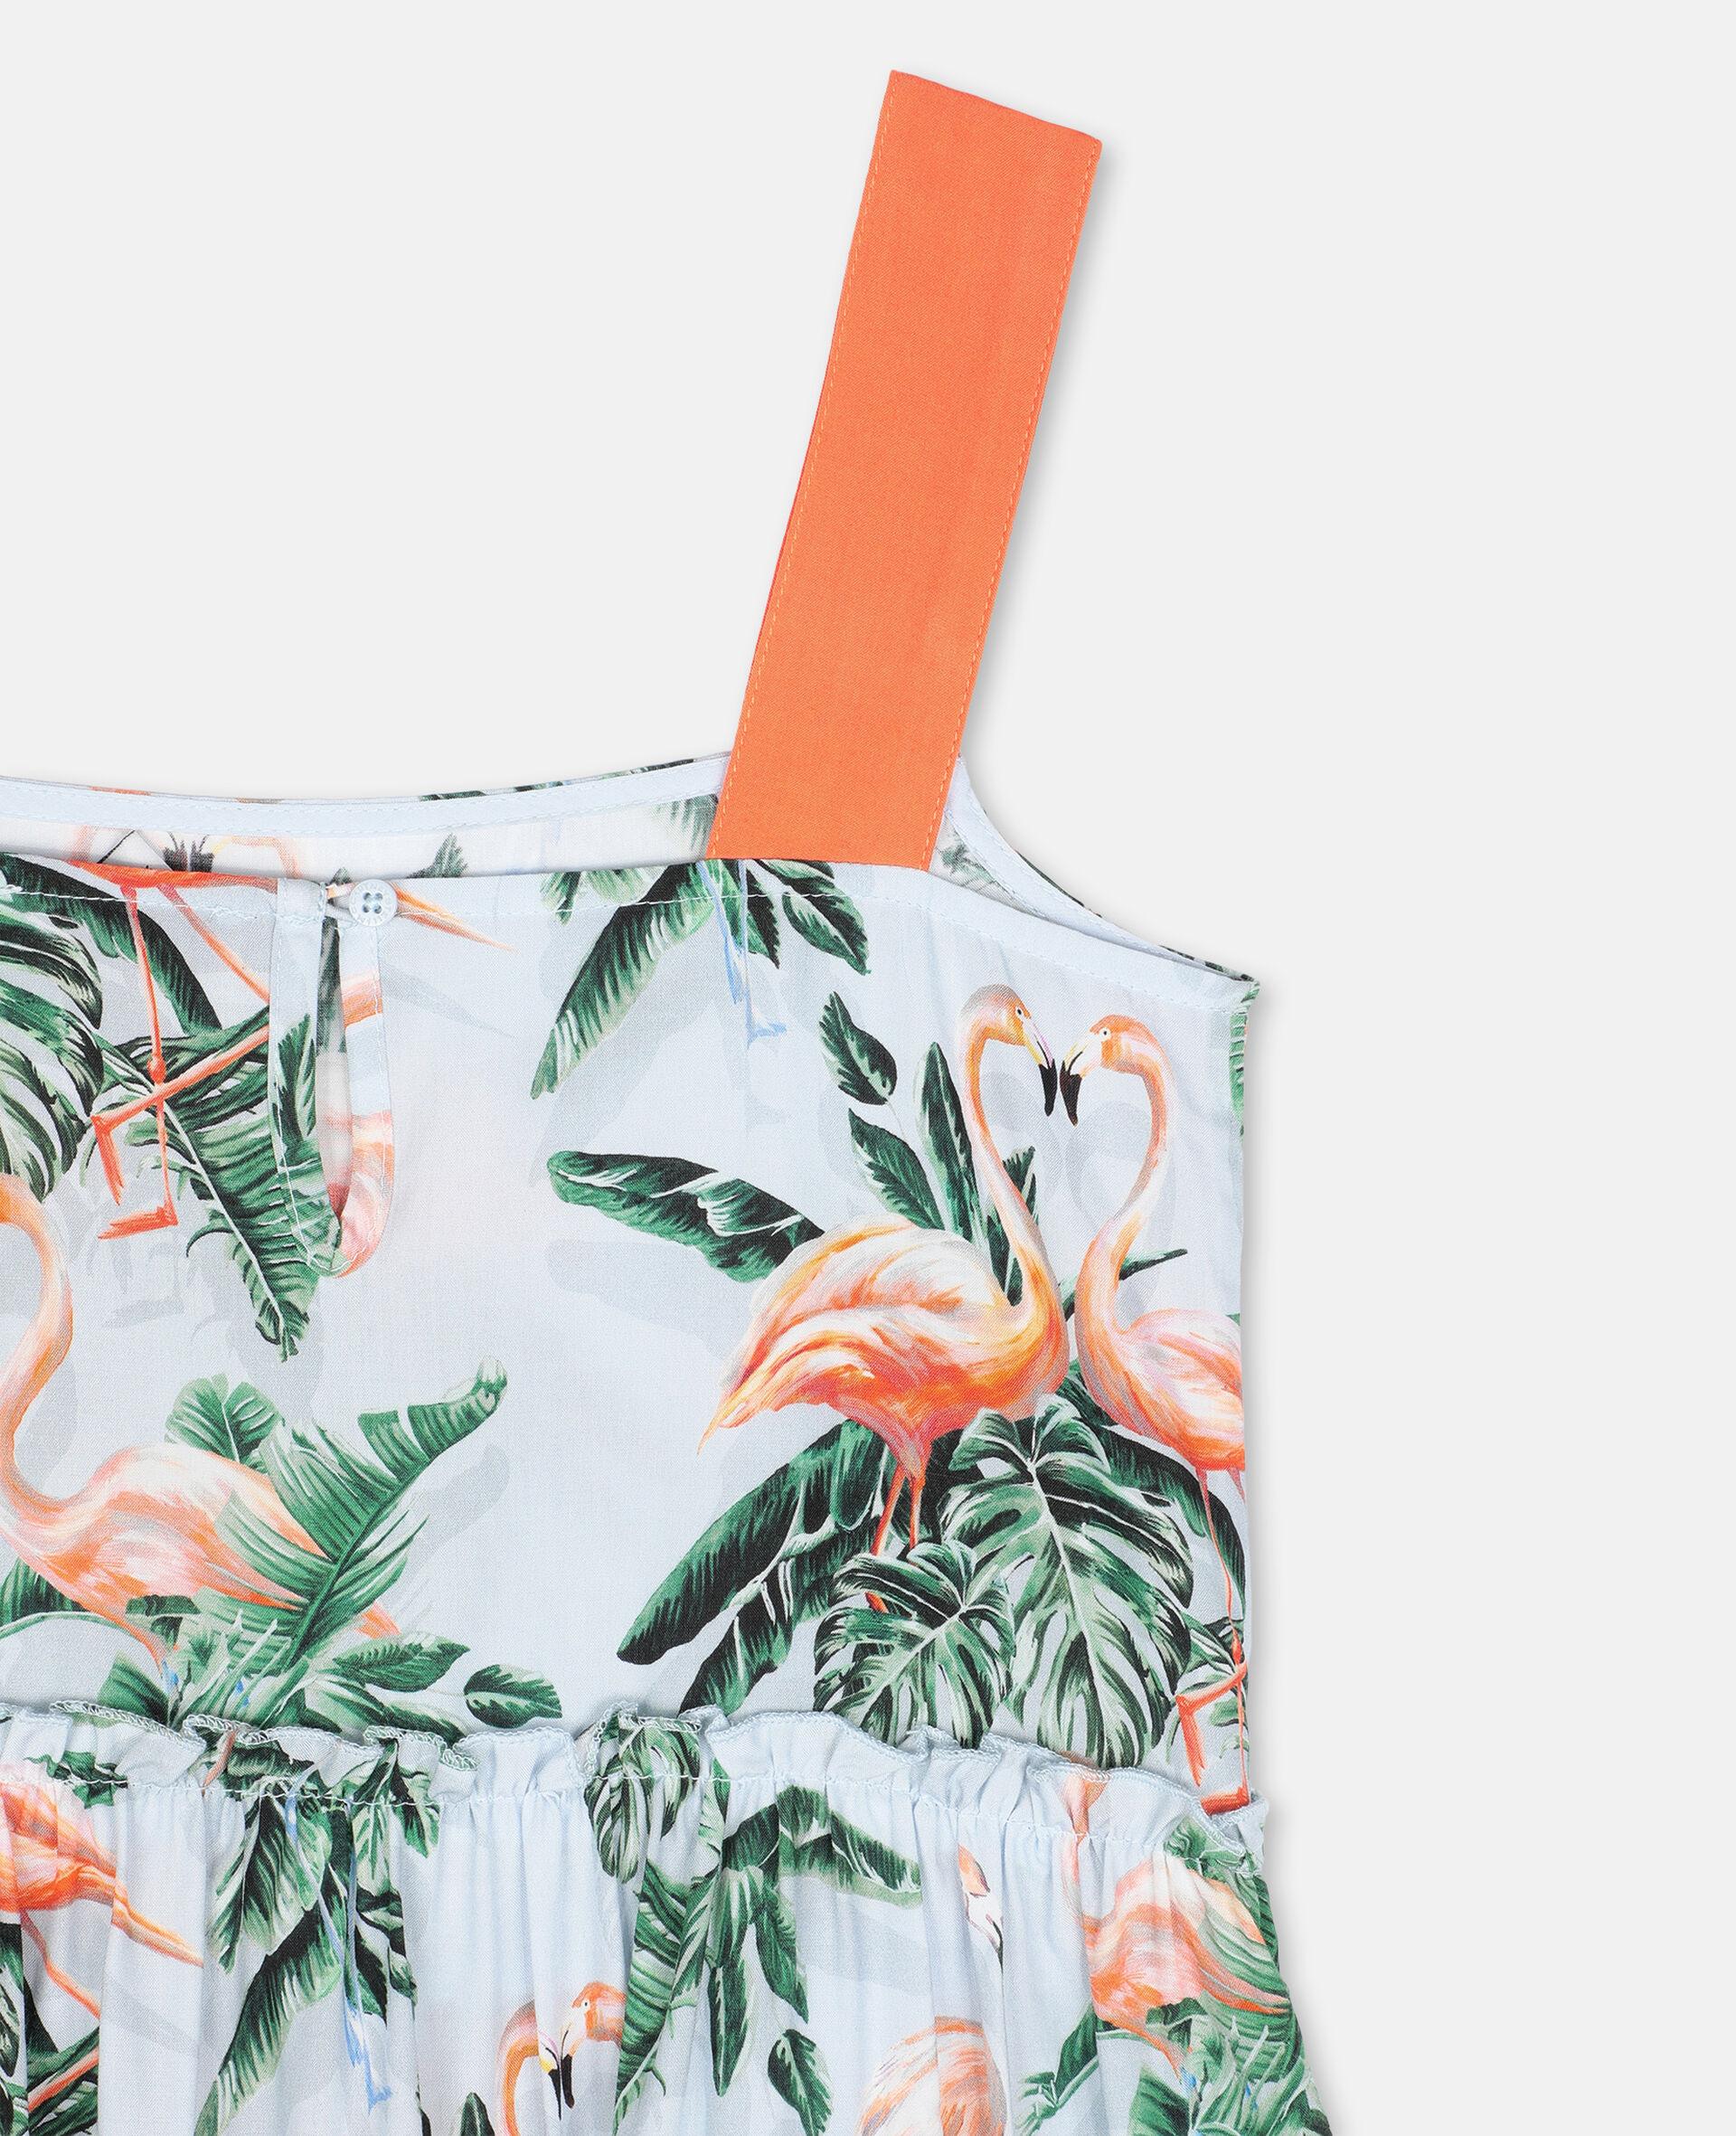 Painty Flamingo粘胶纤维连衣裙-绿色-large image number 2